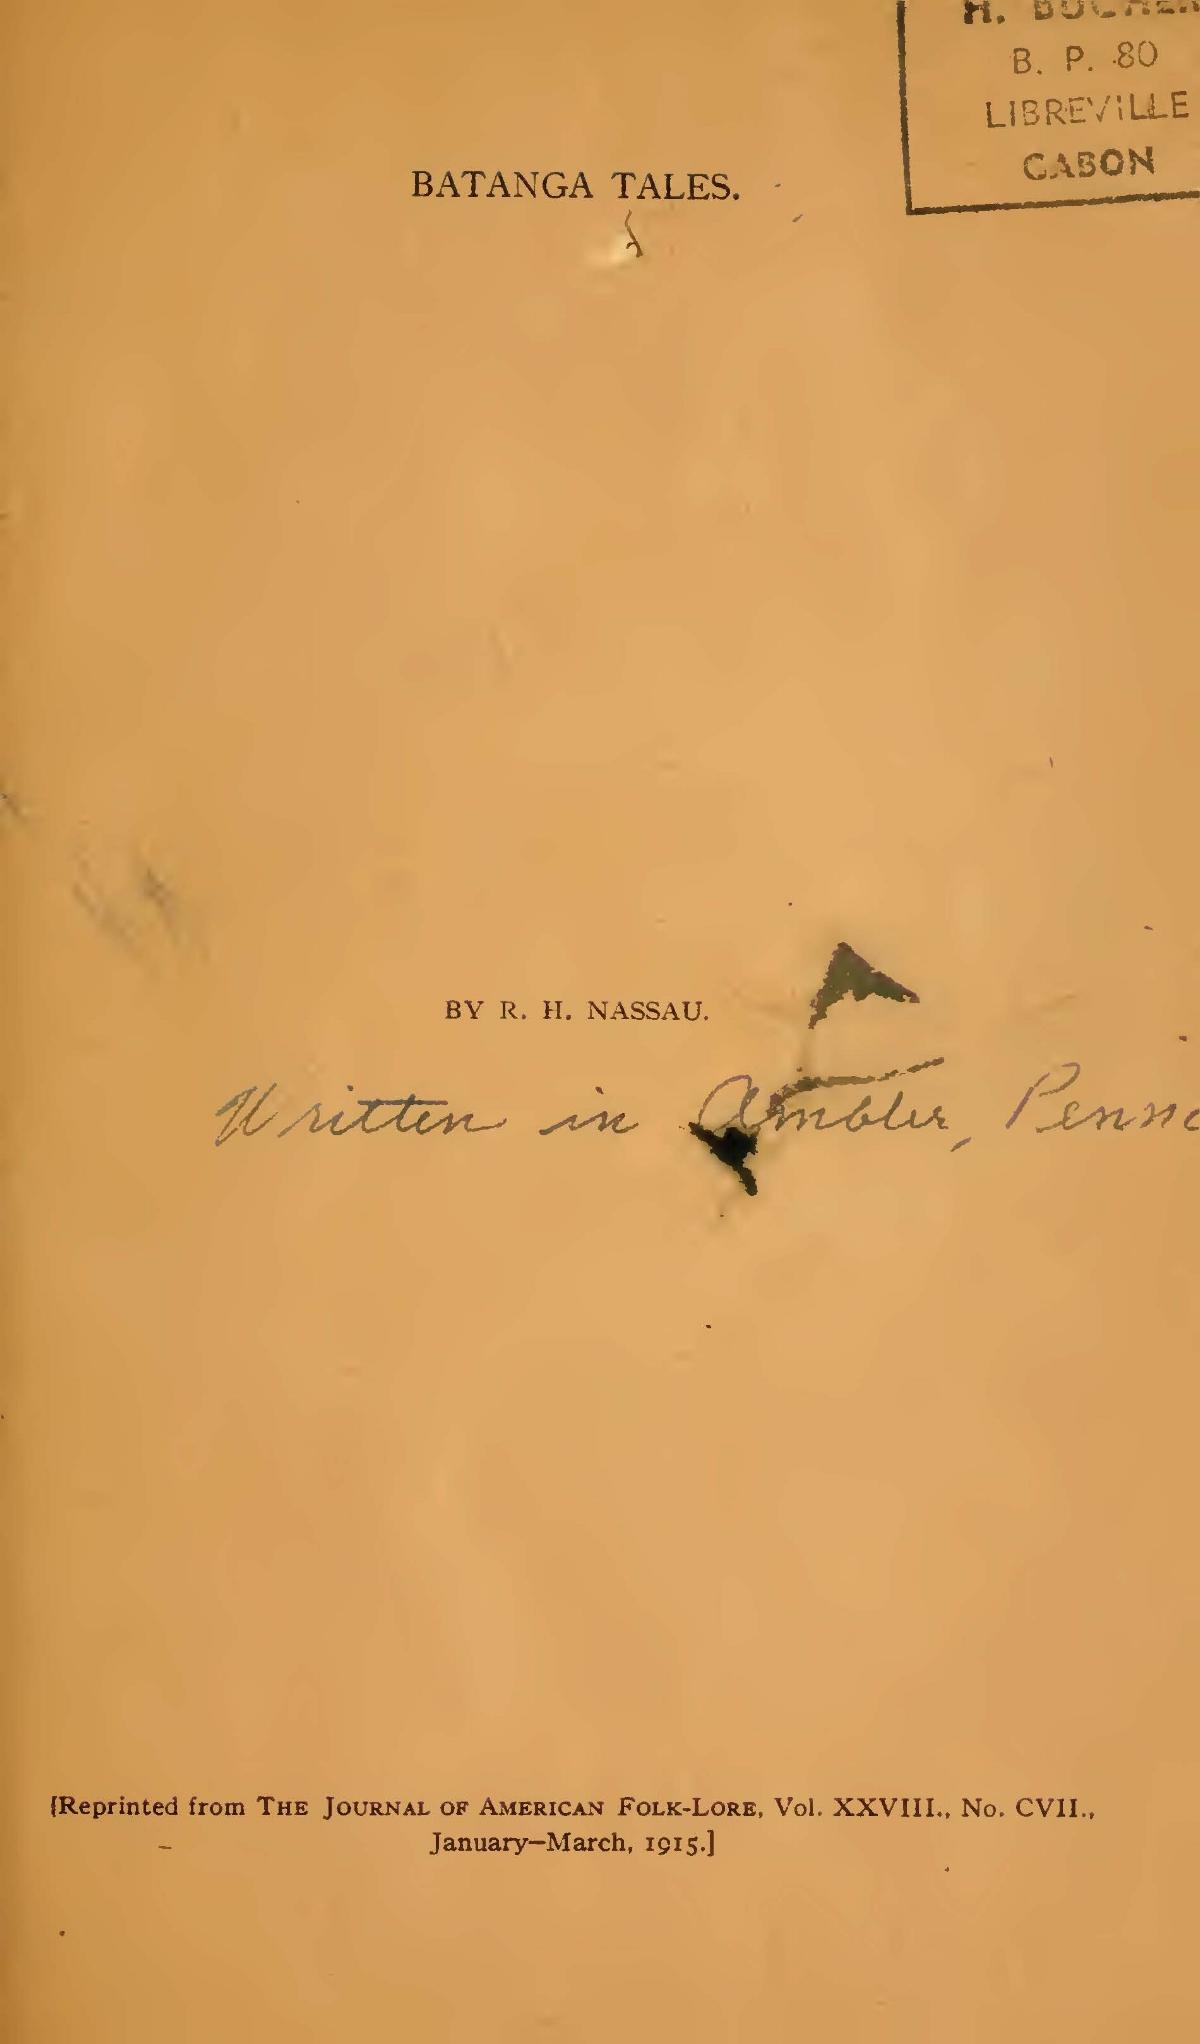 Nassau, Robert Hamill, Batanga Tales Title Page.jpg